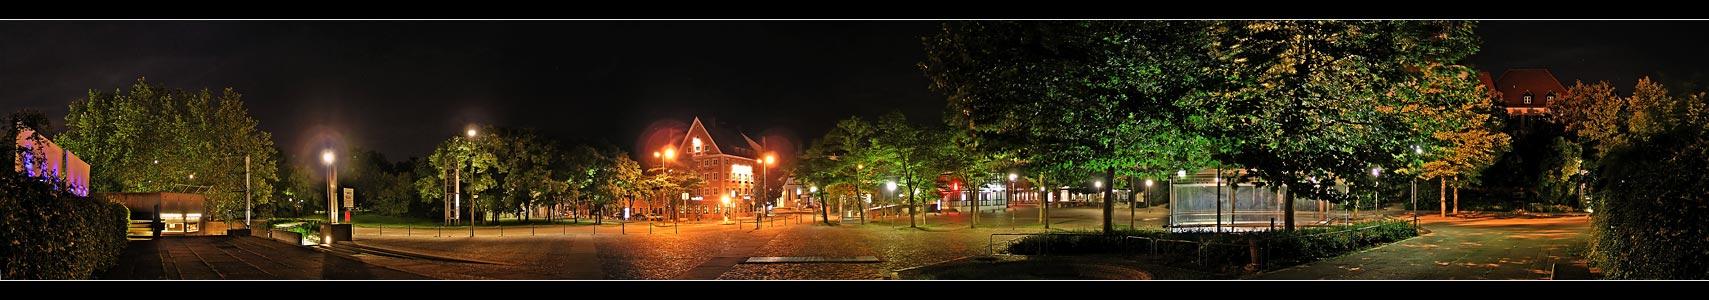 DRI Panorama (Ingolstadt Marktplatz)